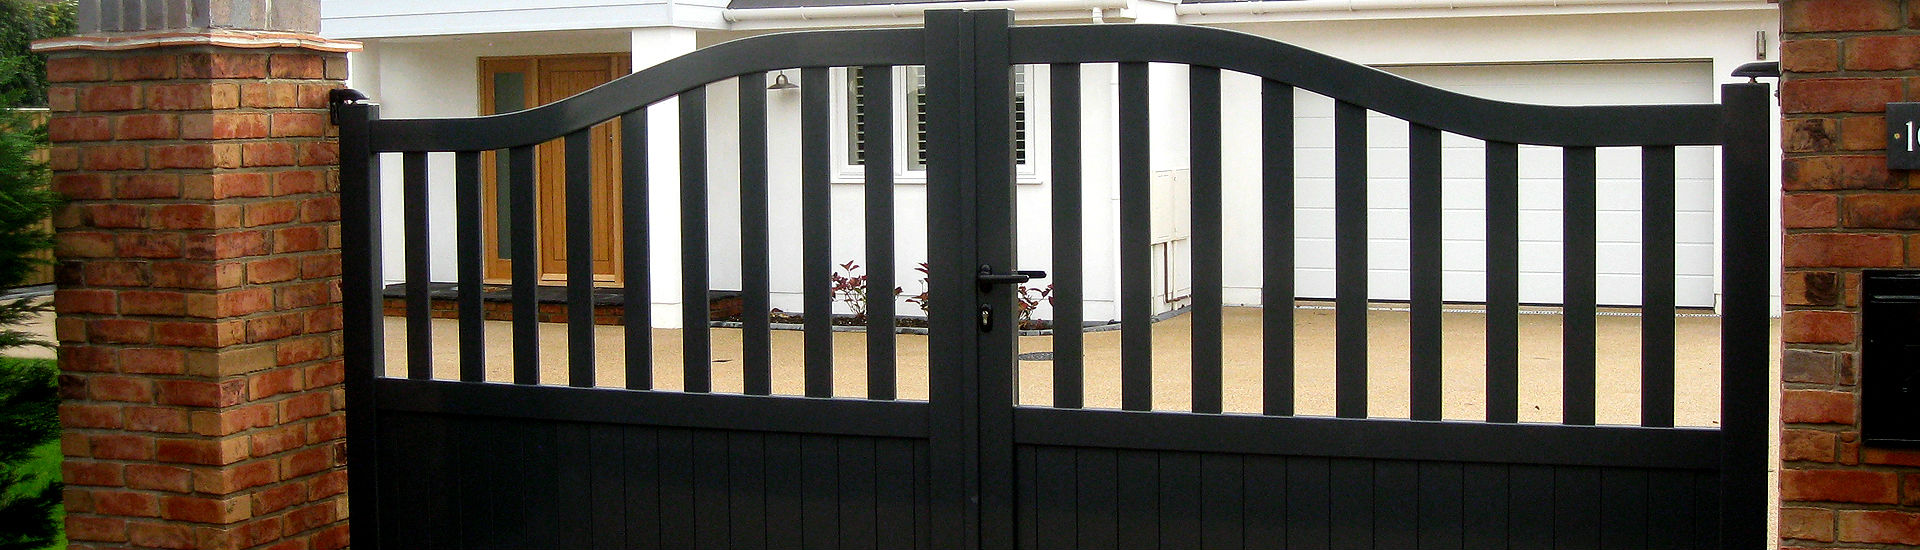 Aluminium Gates from Linkcare